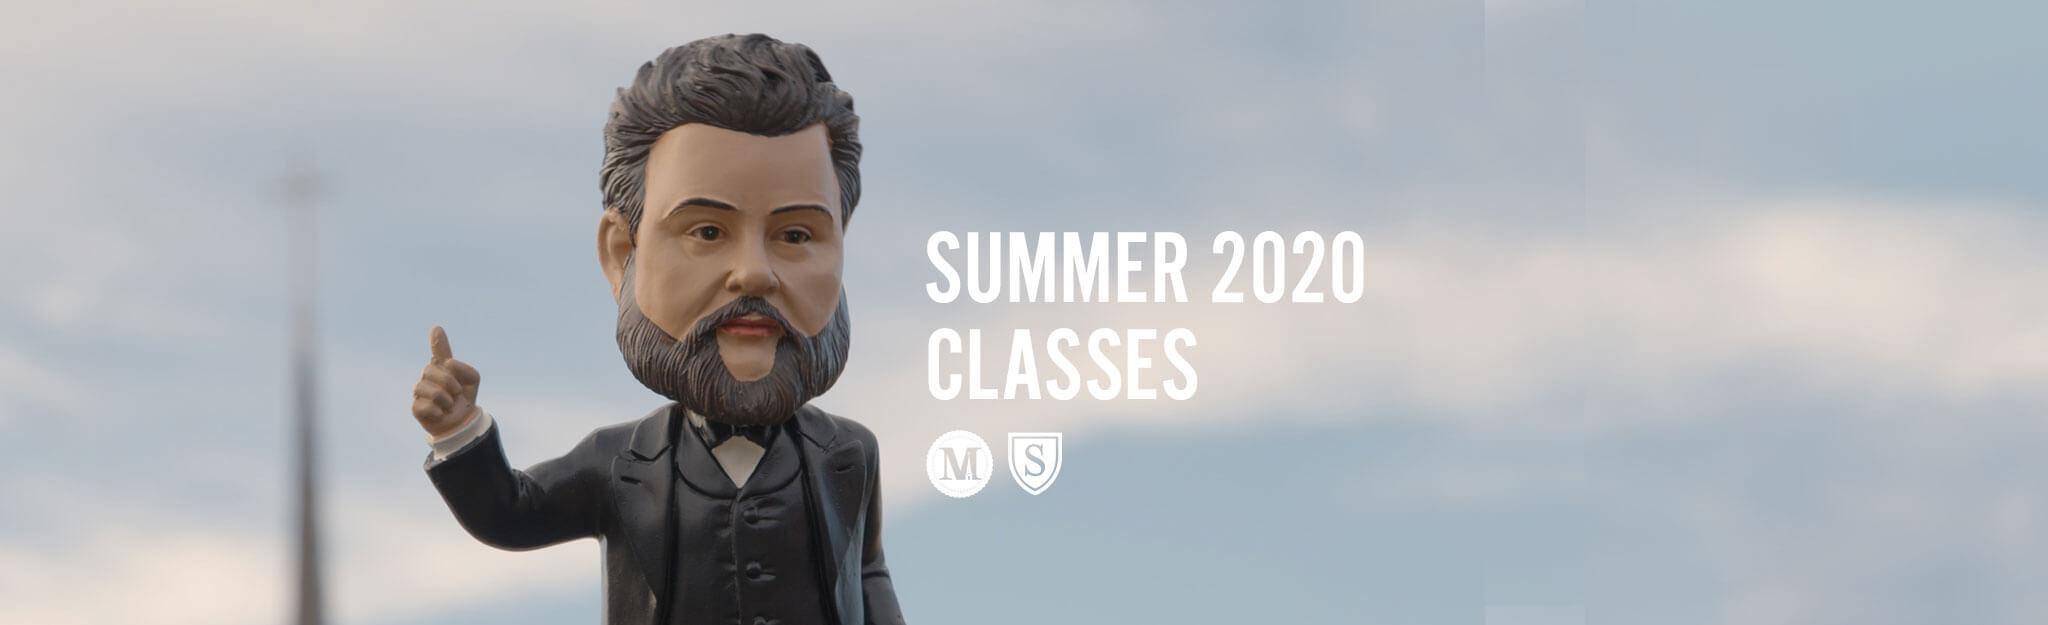 Summer 2020 Classes